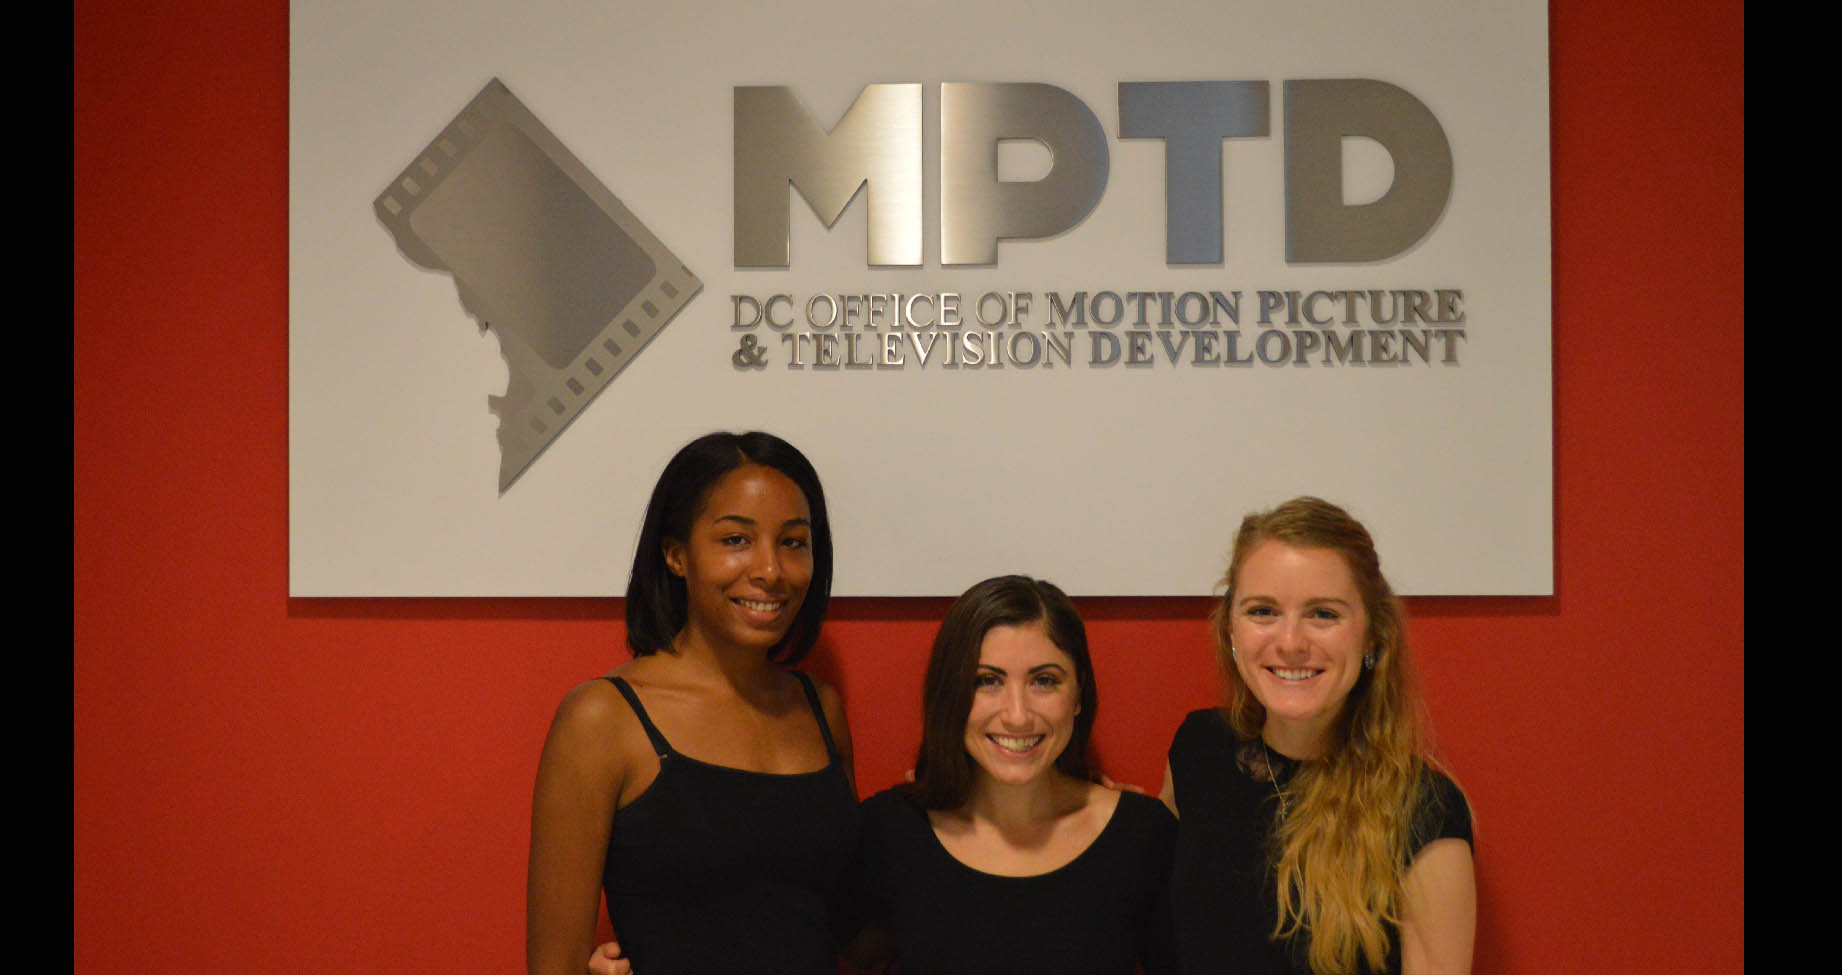 MPTD Interviews DC Webfest Coordinators